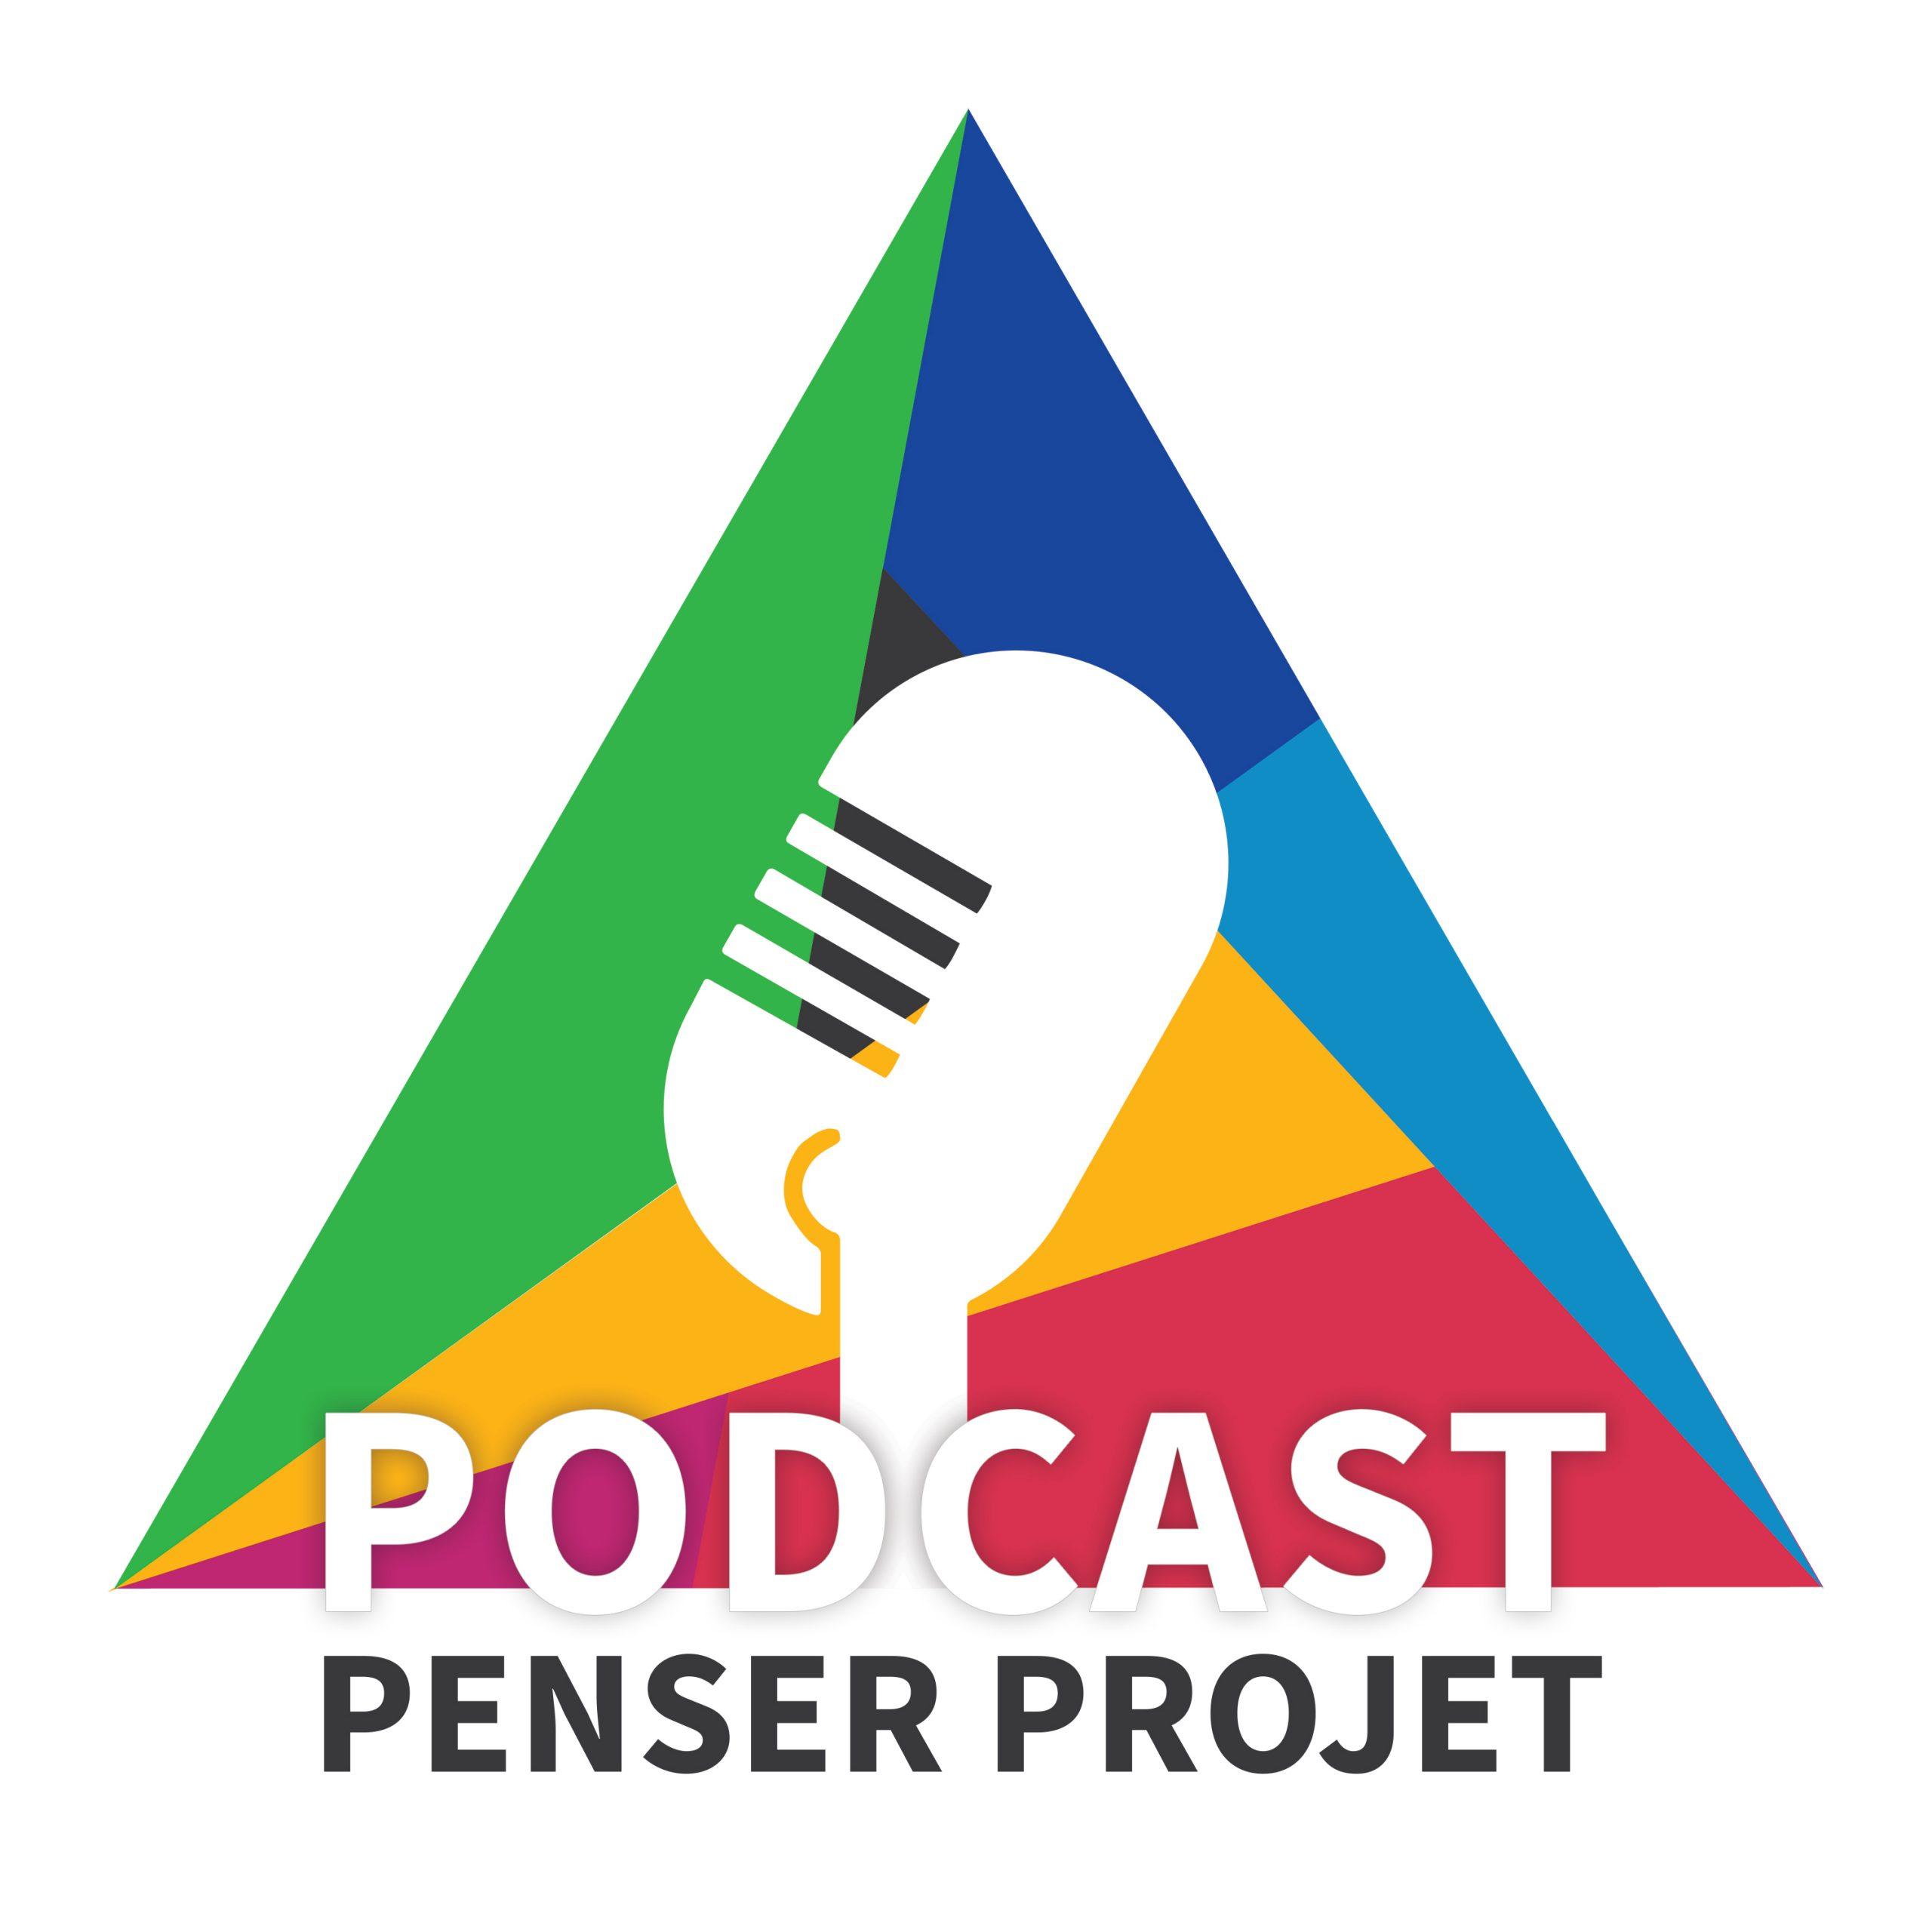 Podcast Penser Projet